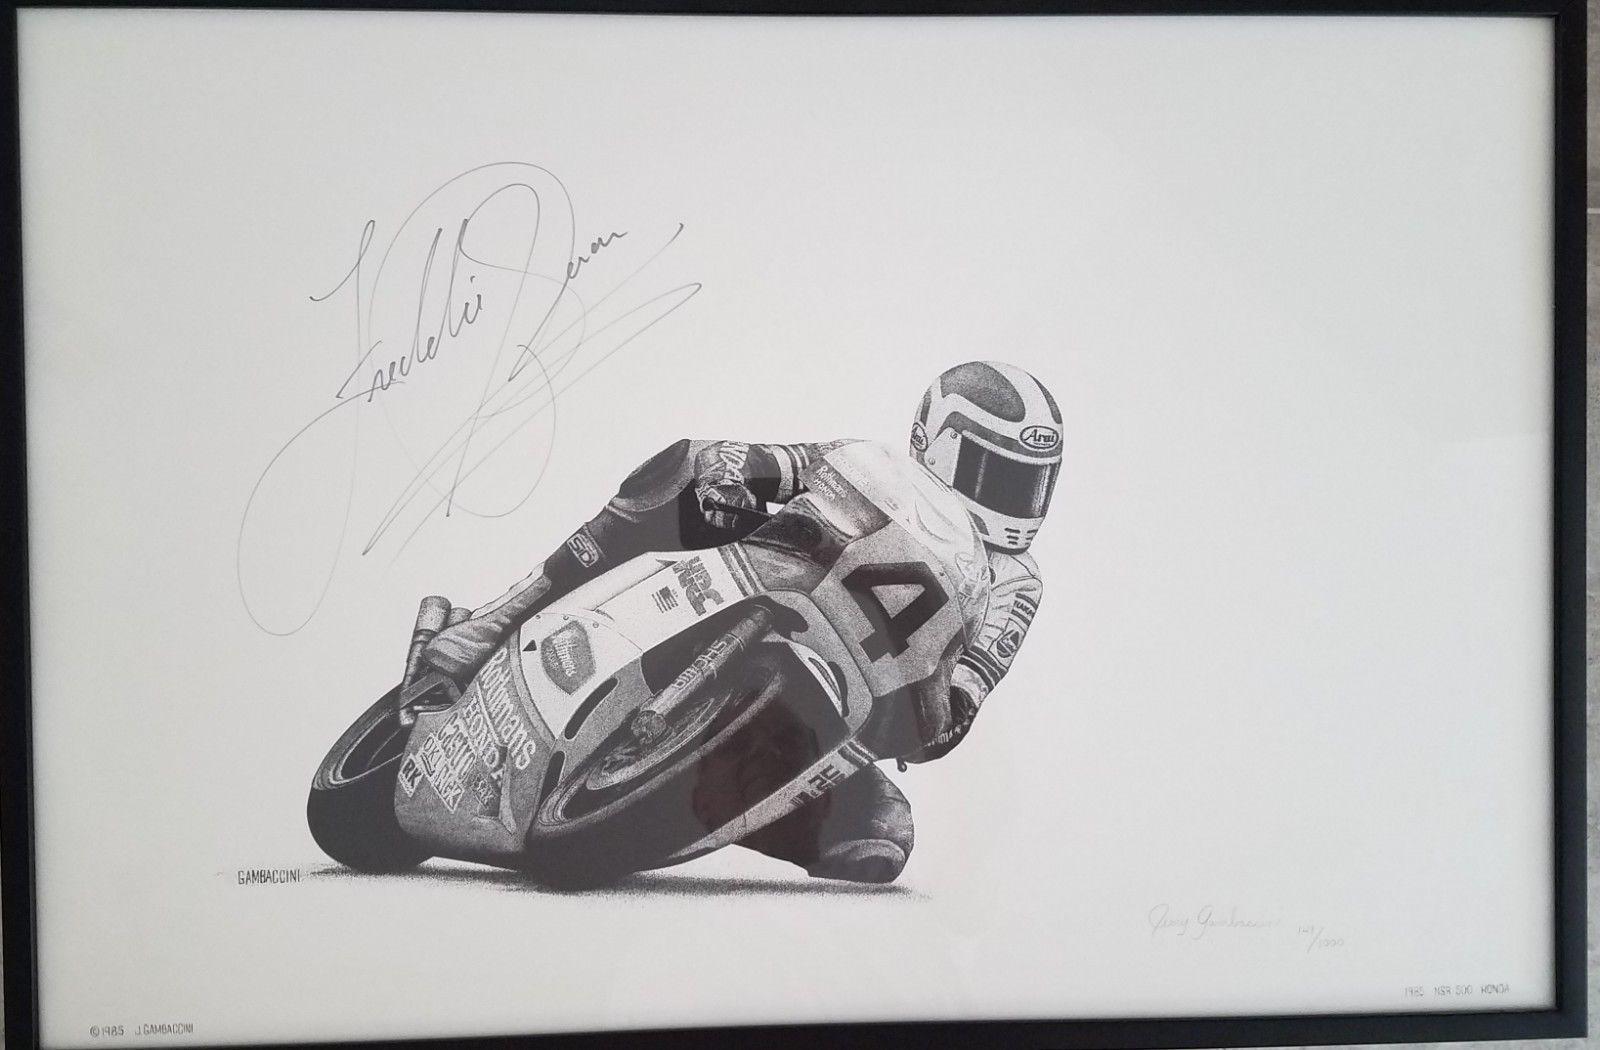 The Las Vegas Motorcycle Auction